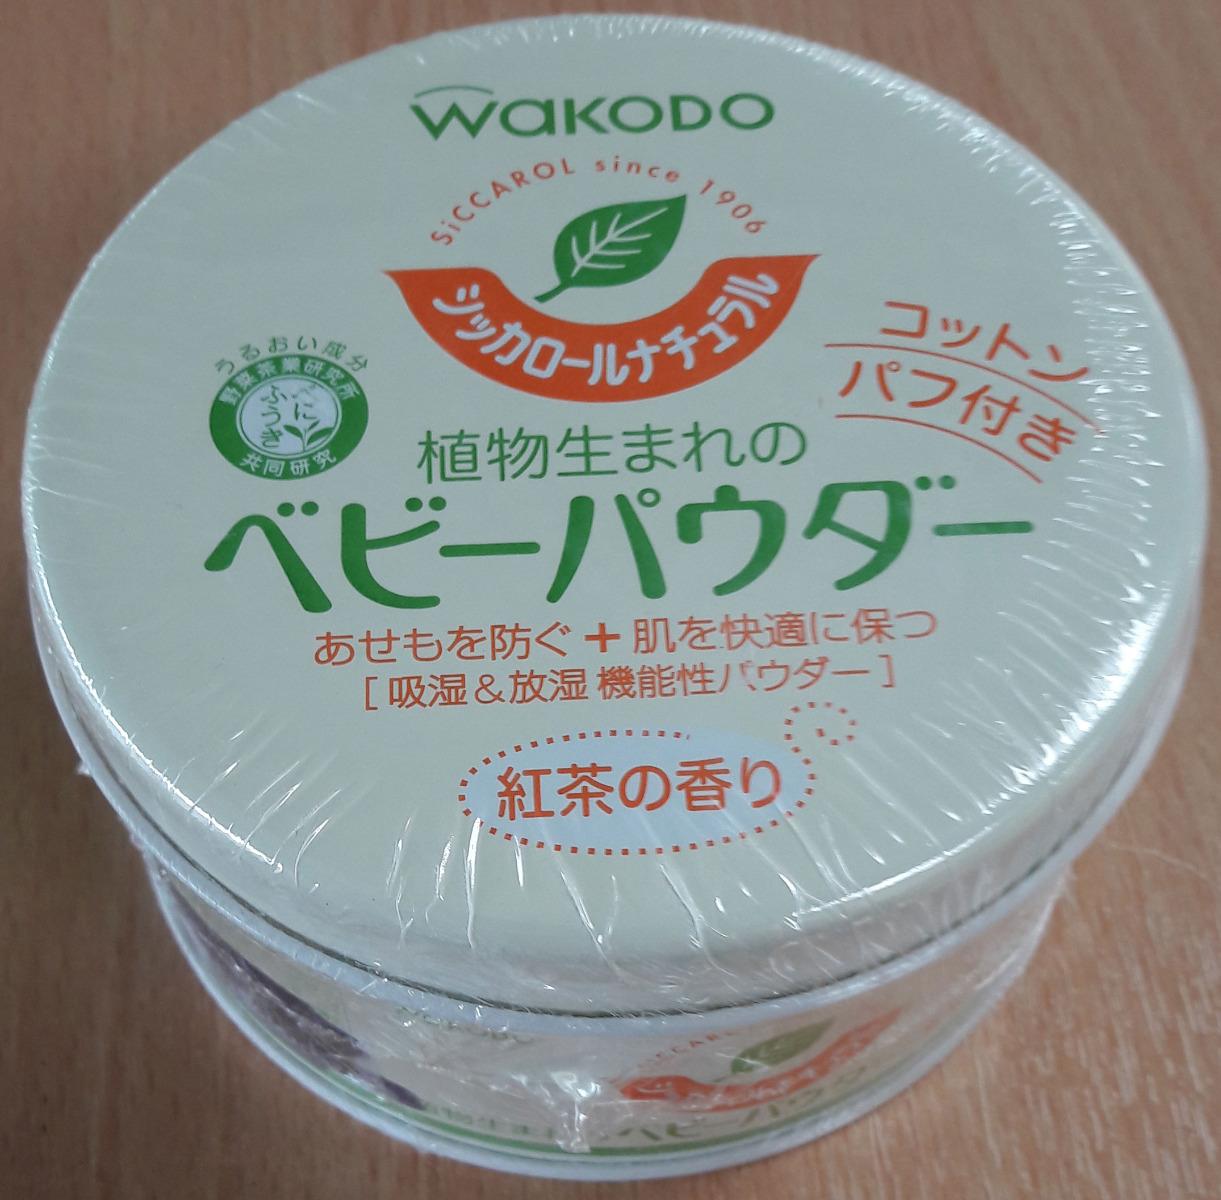 Wakodo Dusting Powder (120g) - Damaged